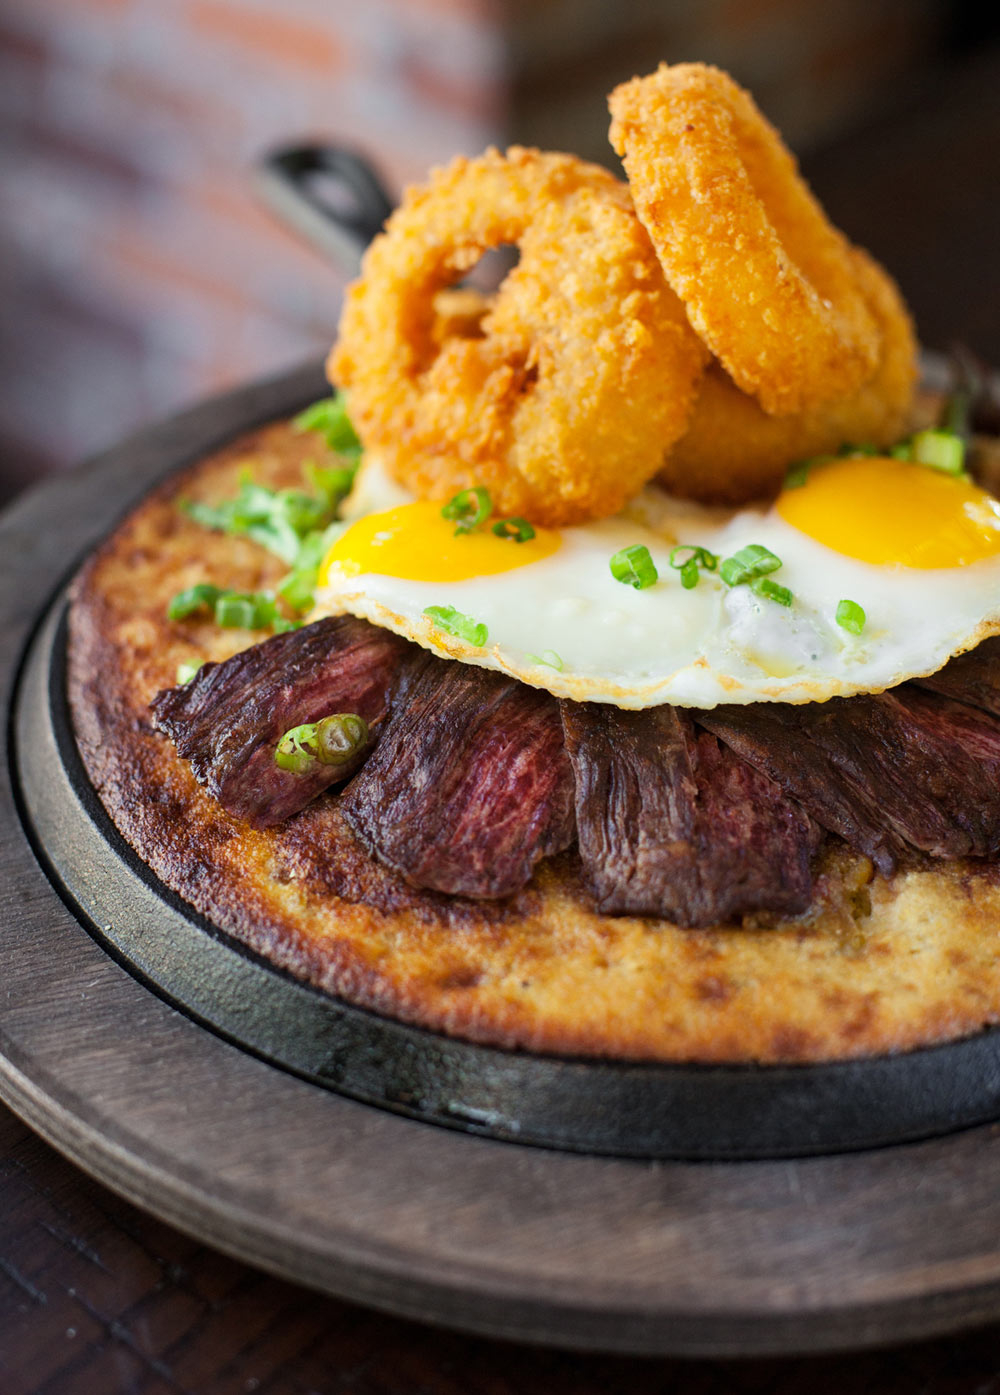 Food_photography_steak_eggs_brunch_patio_best_mimosas_bloody_marys.jpg